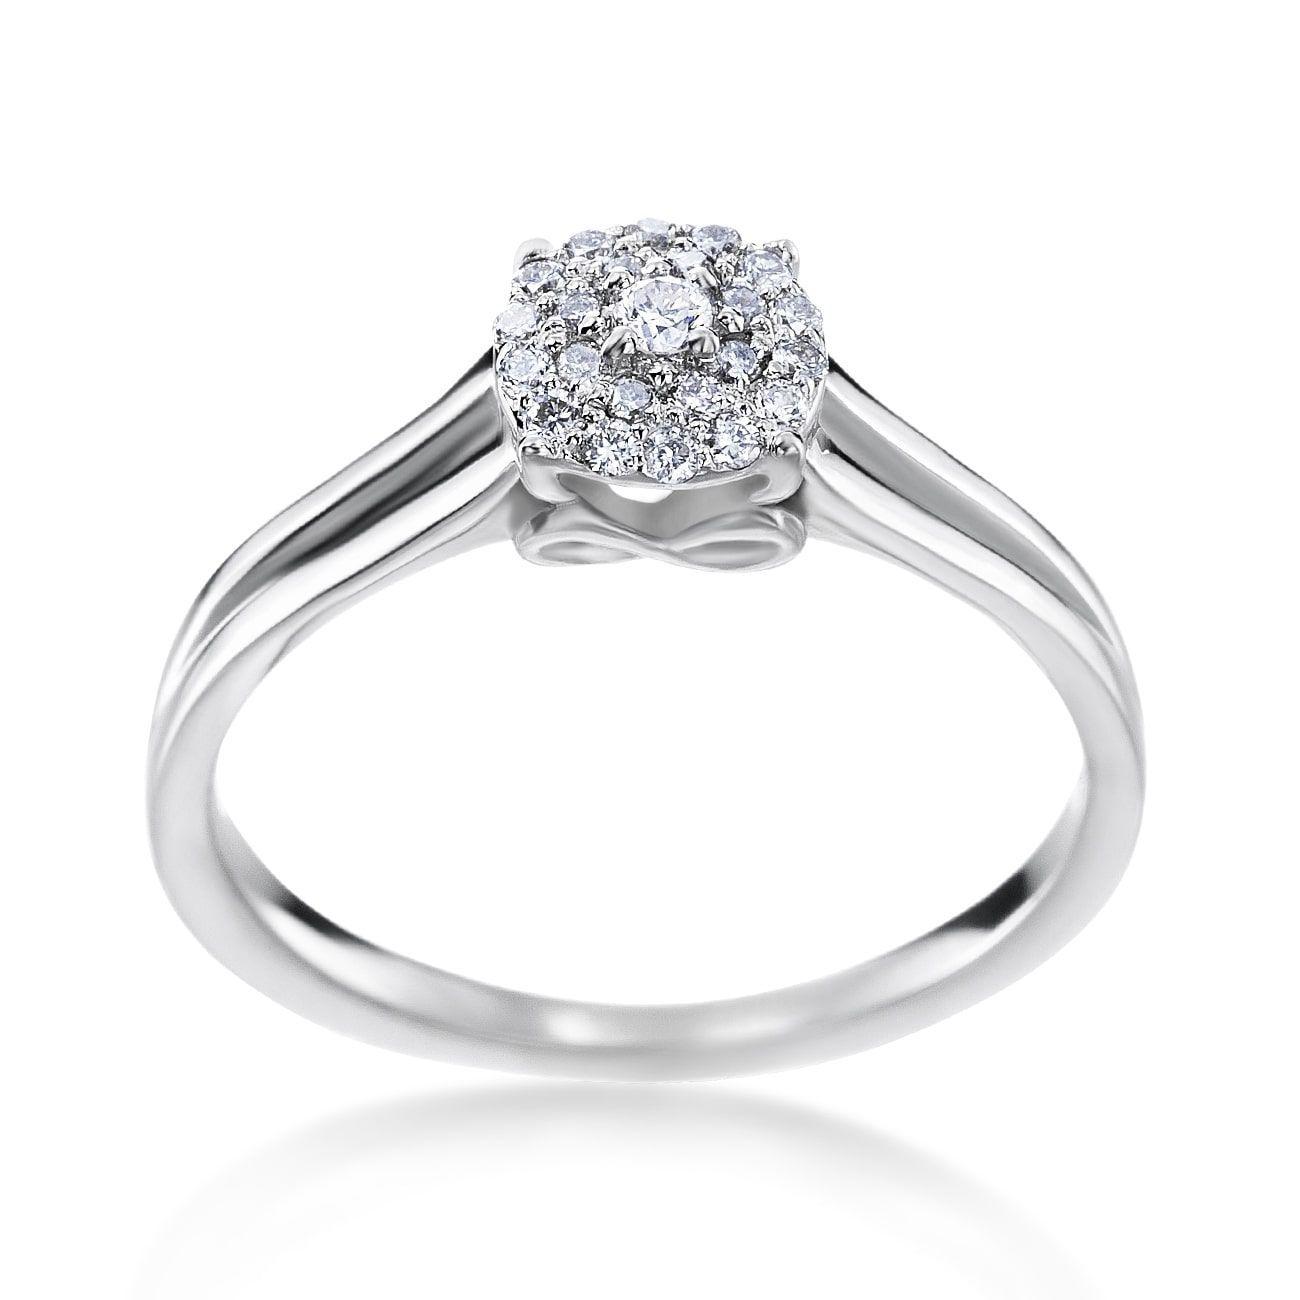 SummerRose 14k Gold 1/5ct TDW Diamond Fashion Ring